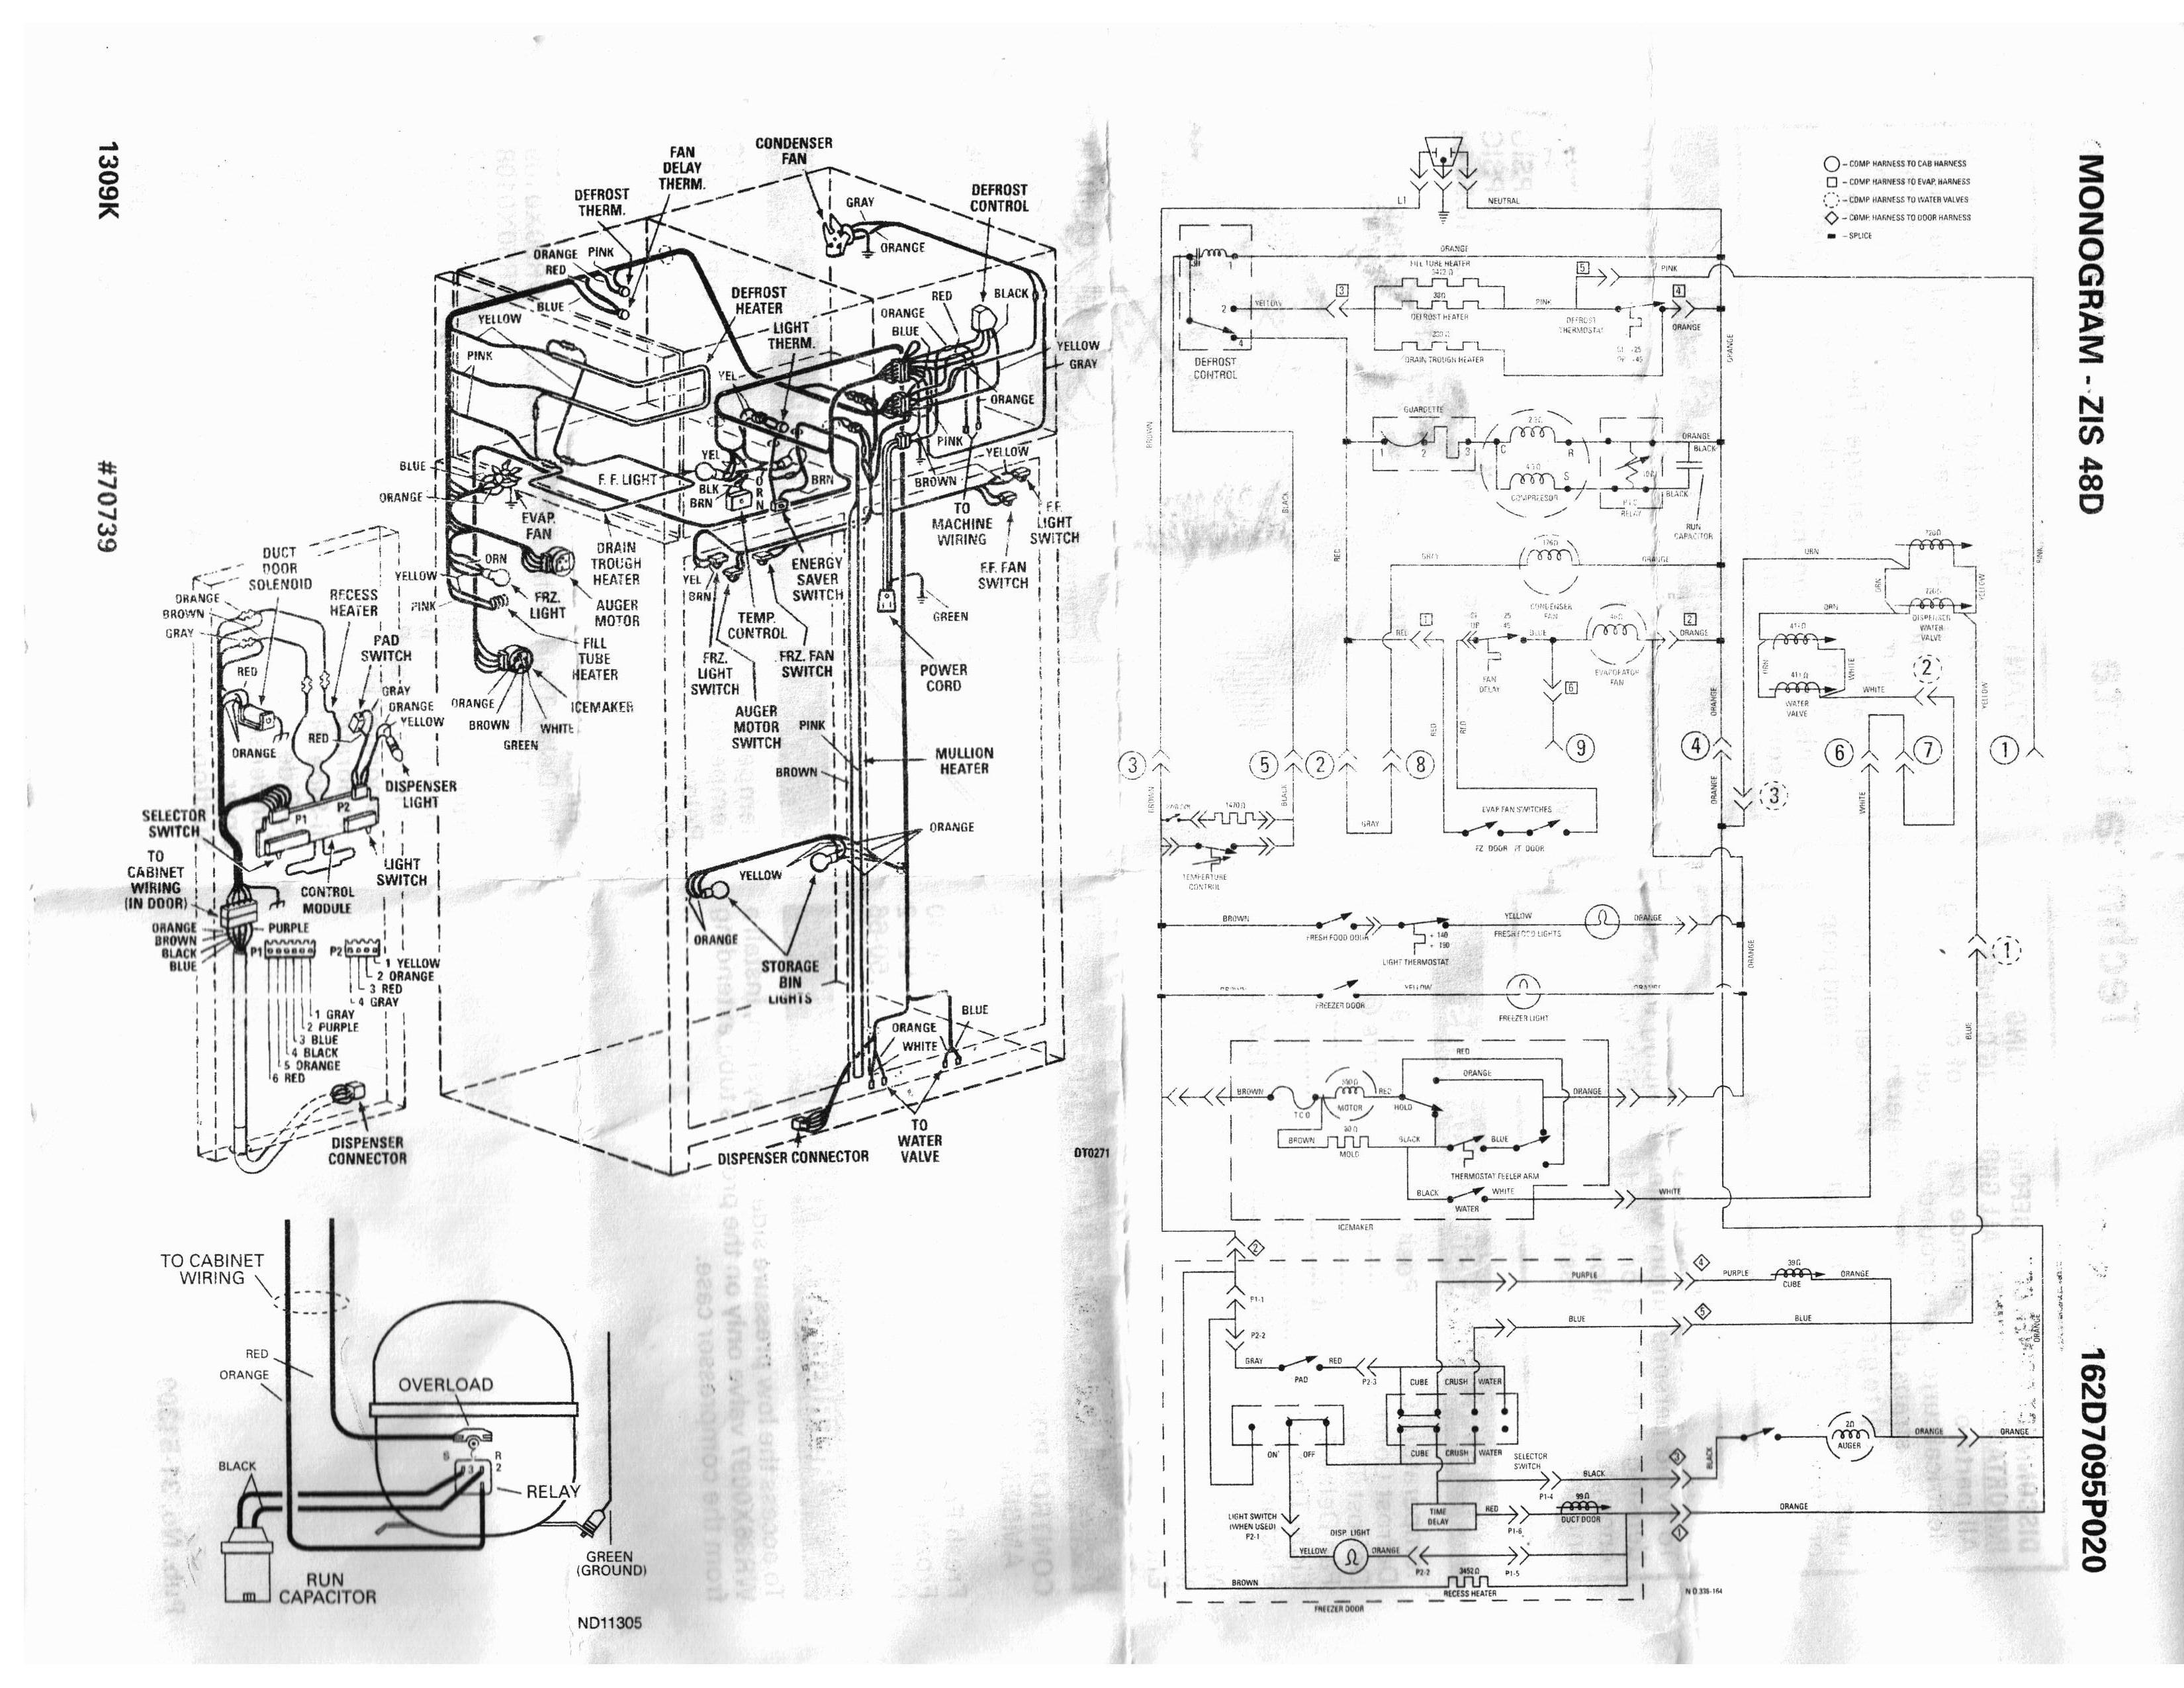 wiring diagram of refrigerator ct70 k1 whirlpool gold free engine